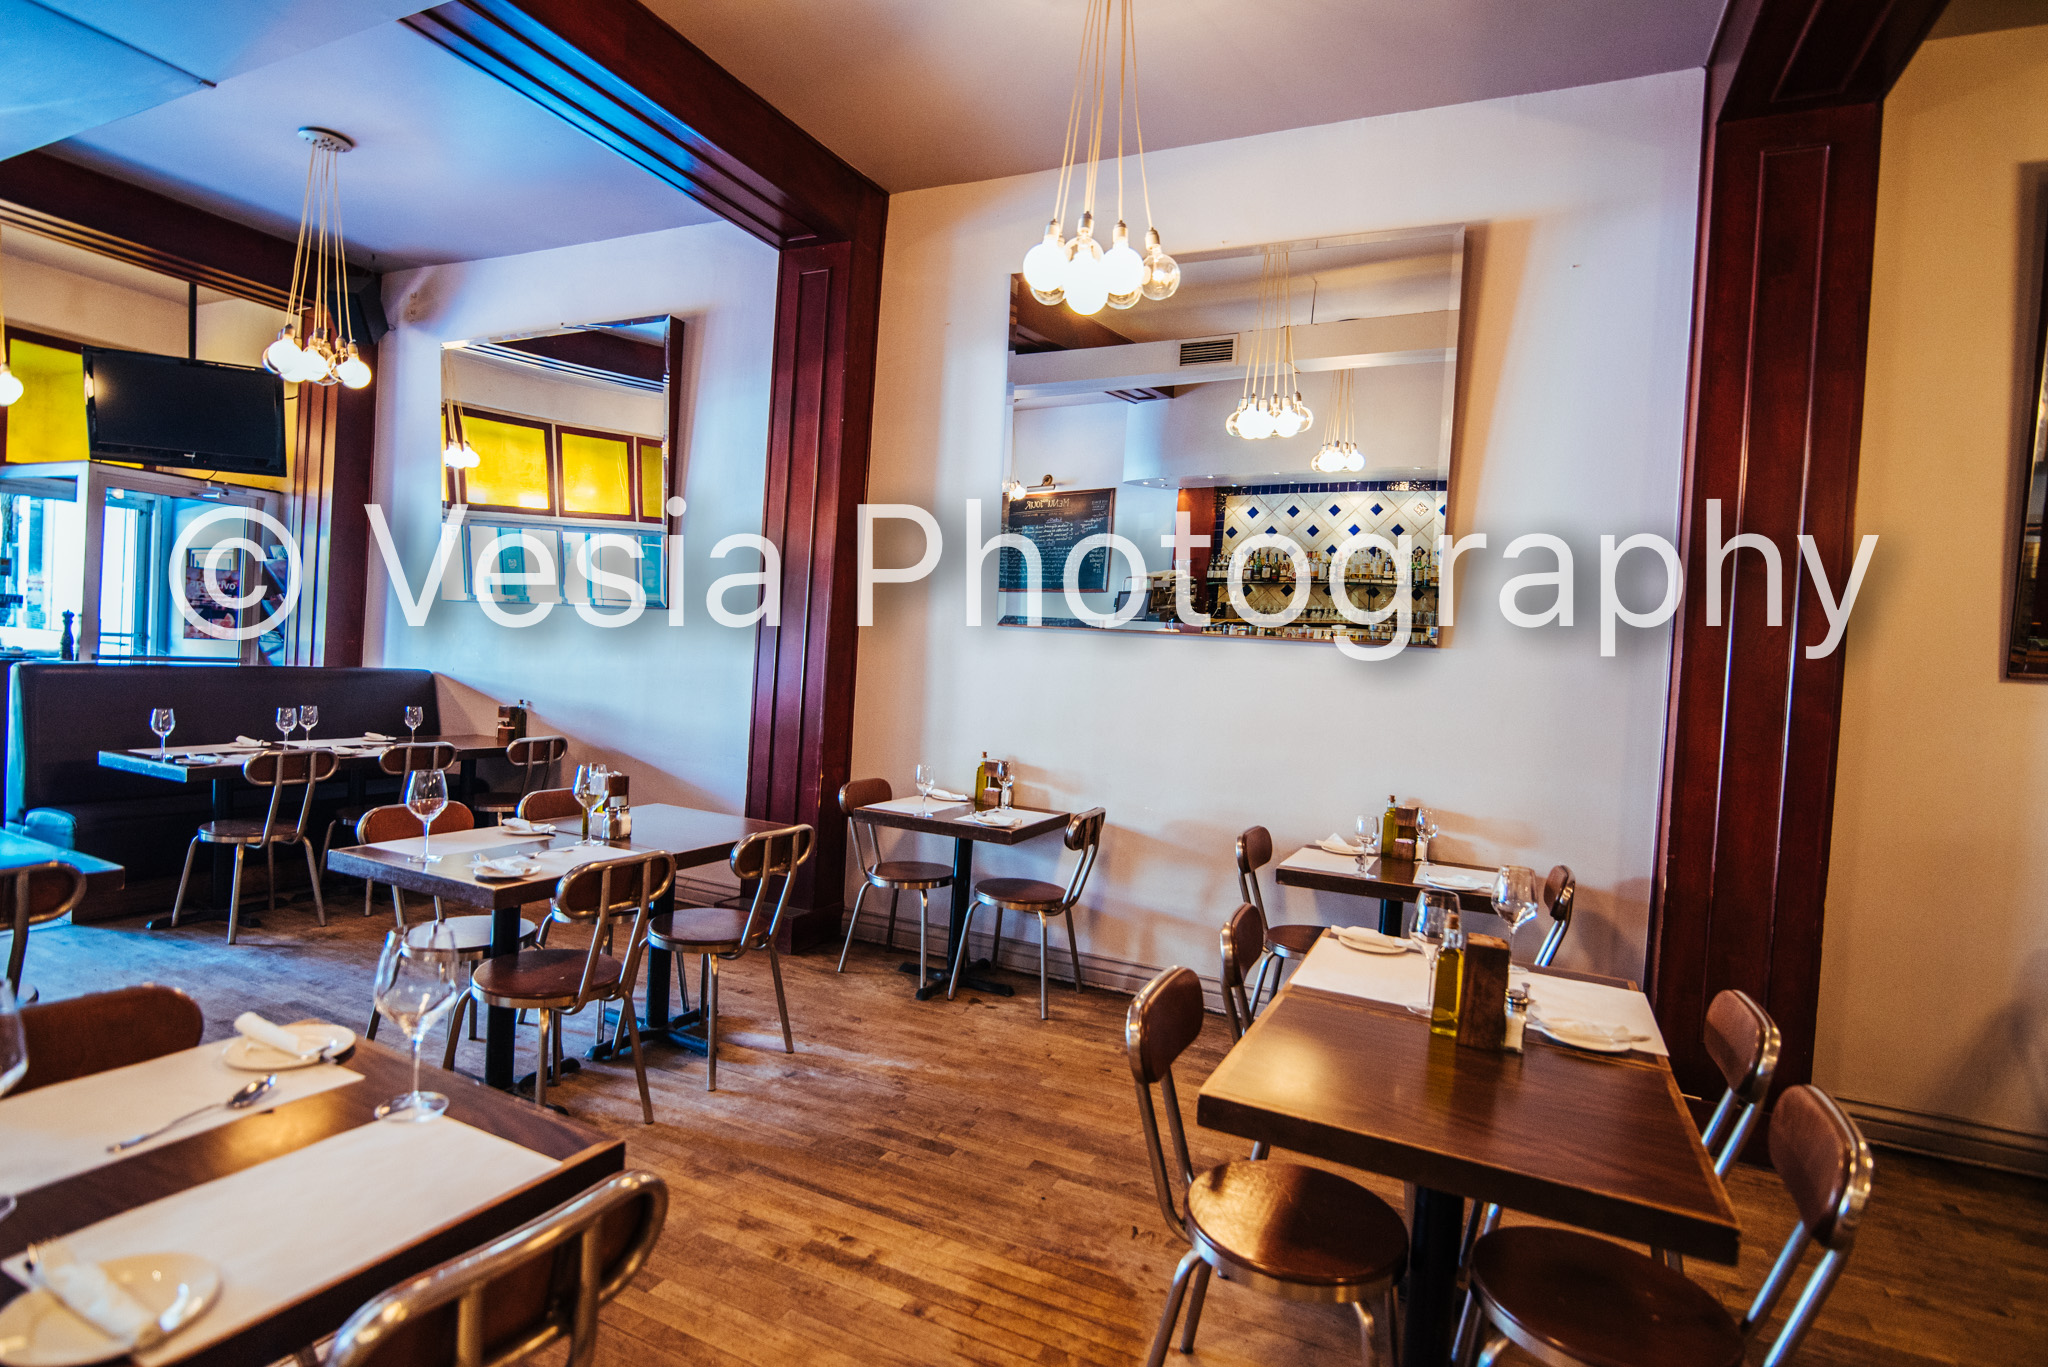 Cafe_Epoca_Proofs-9.jpg